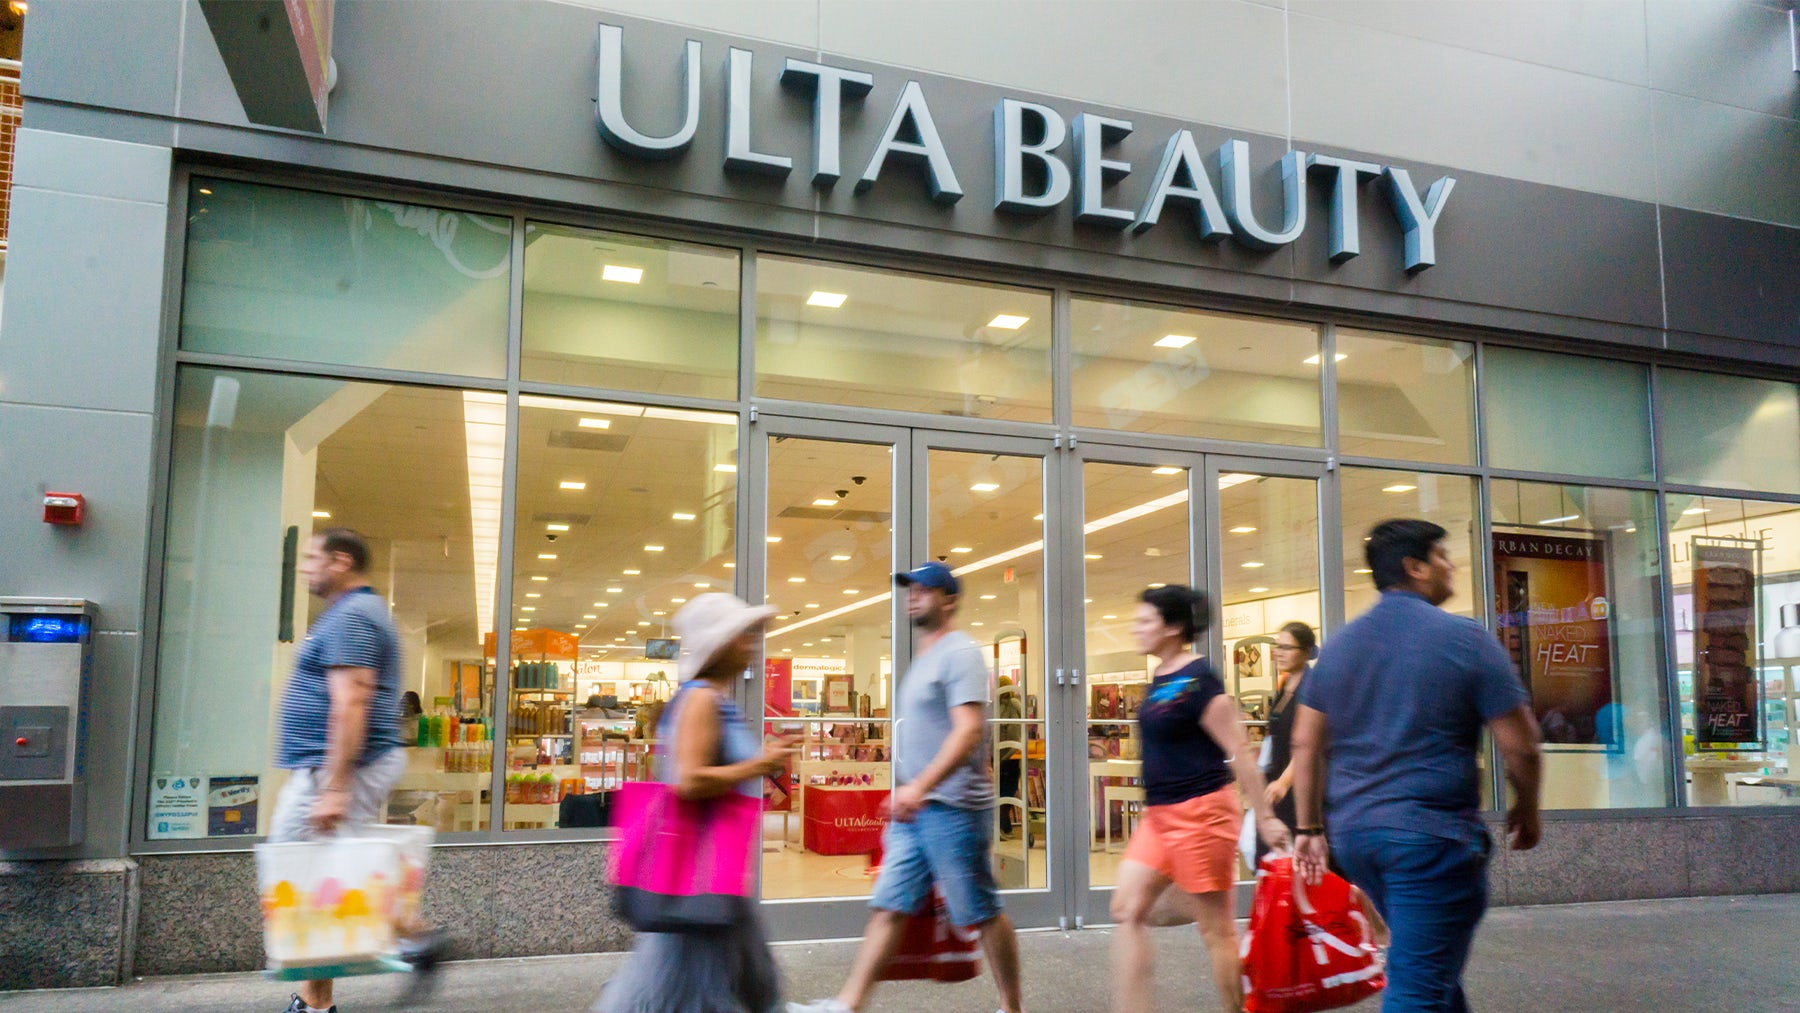 An Ulta Beauty store in New York City. Shutterstock.